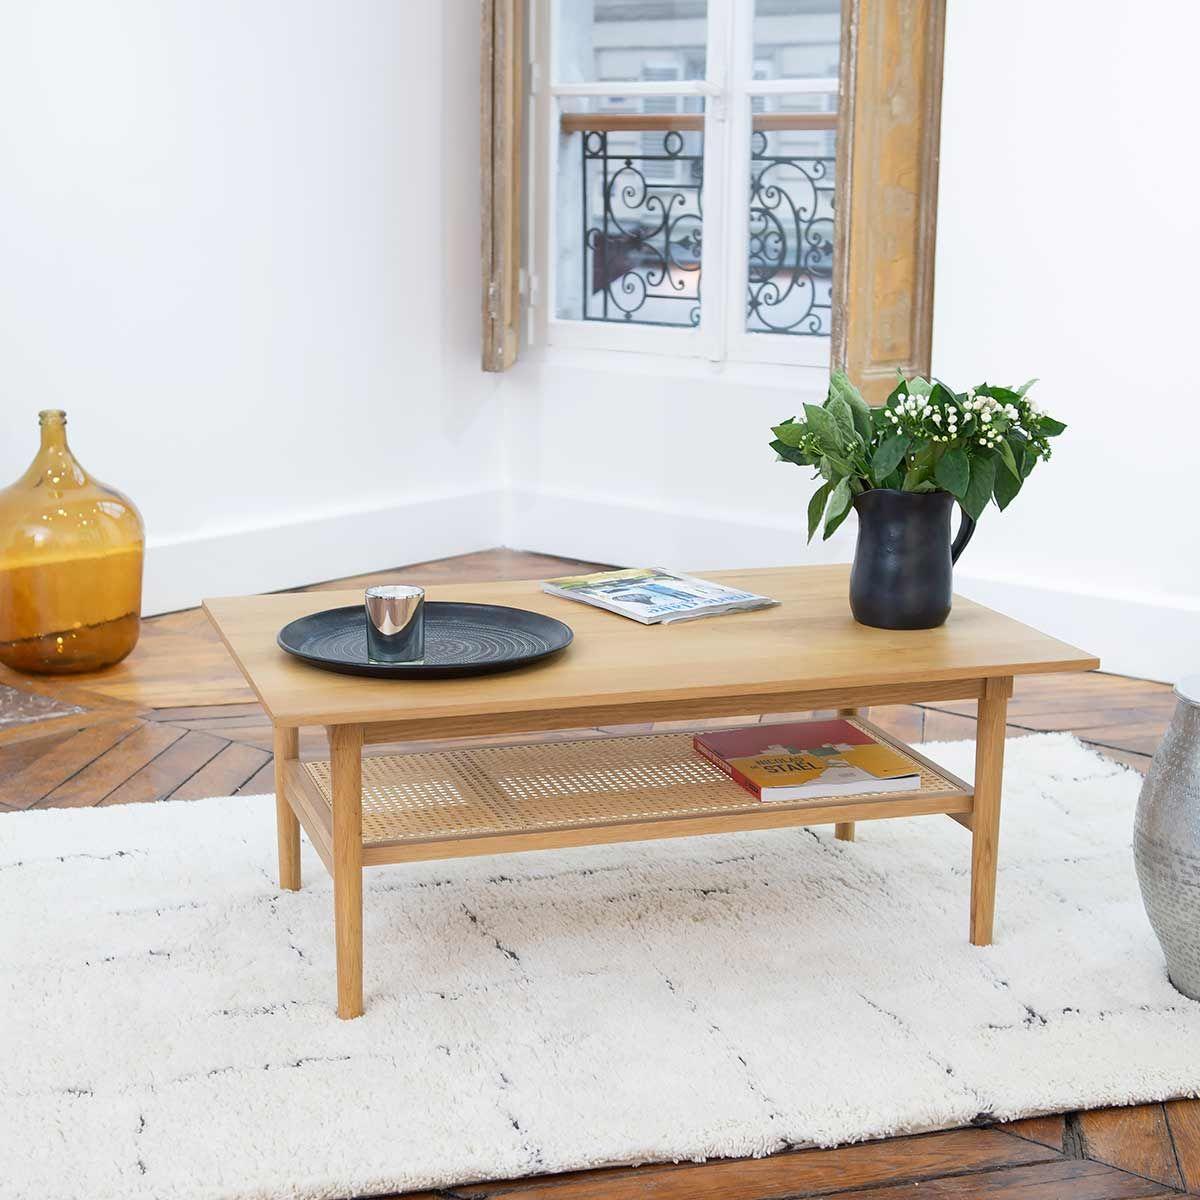 Table basse plaqué chêne cannage en rotin marron